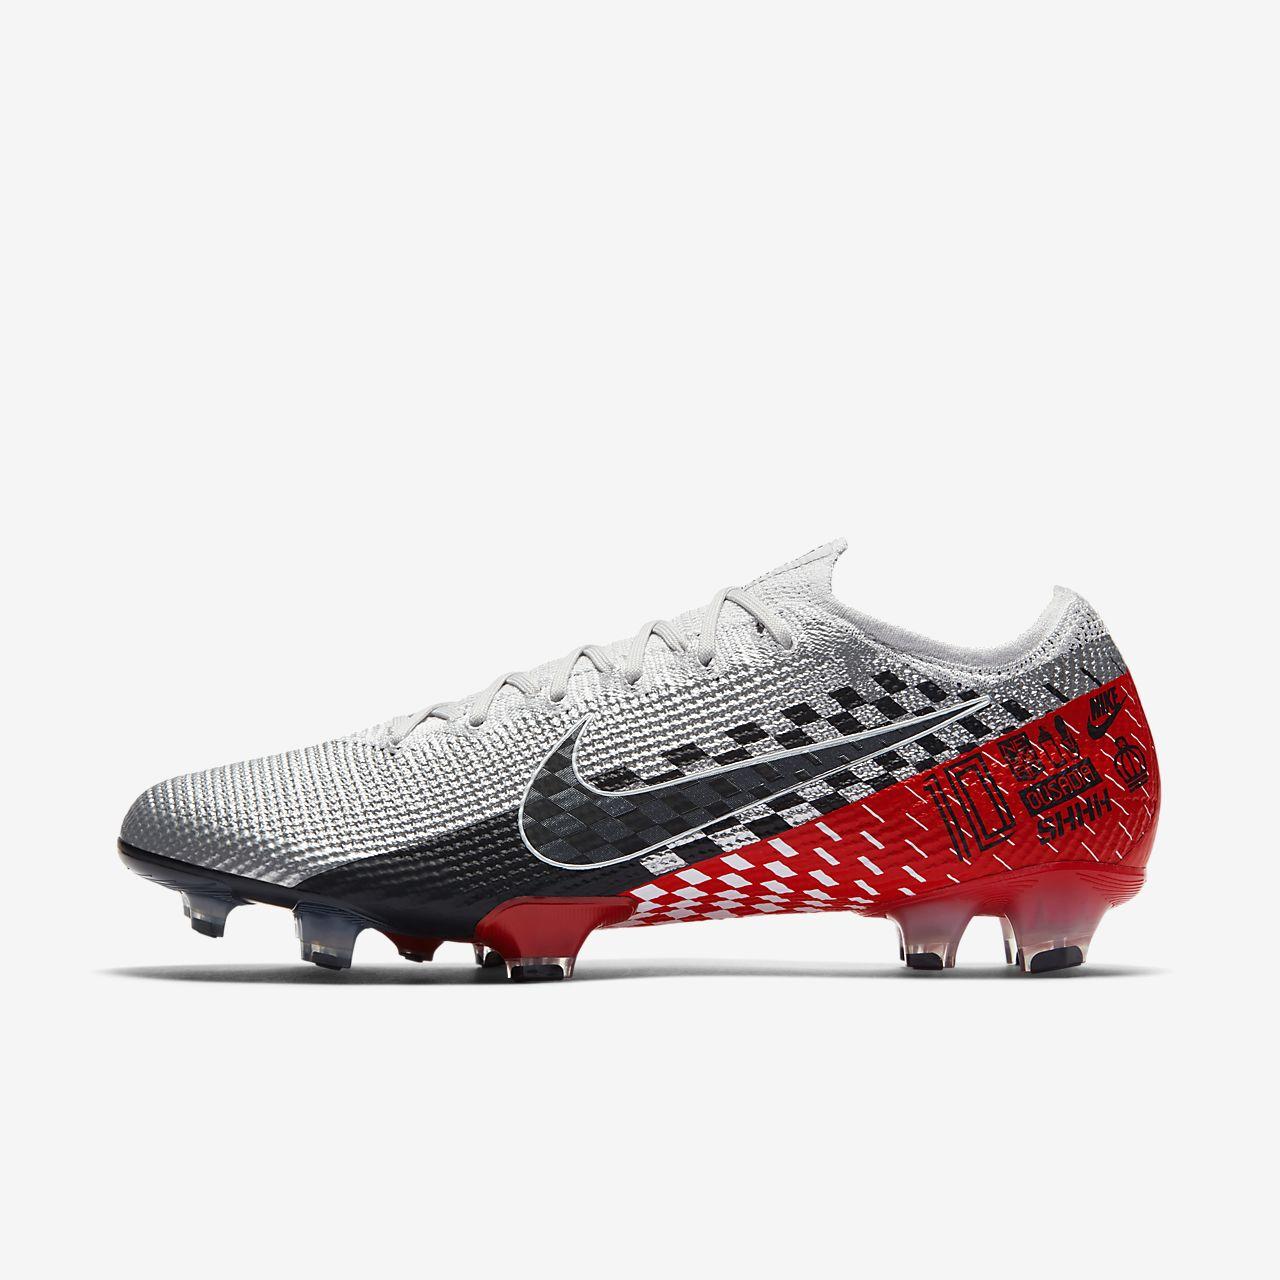 Korki piłkarskie na twardą murawę Nike Mercurial Vapor 13 Elite Neymar Jr. FG